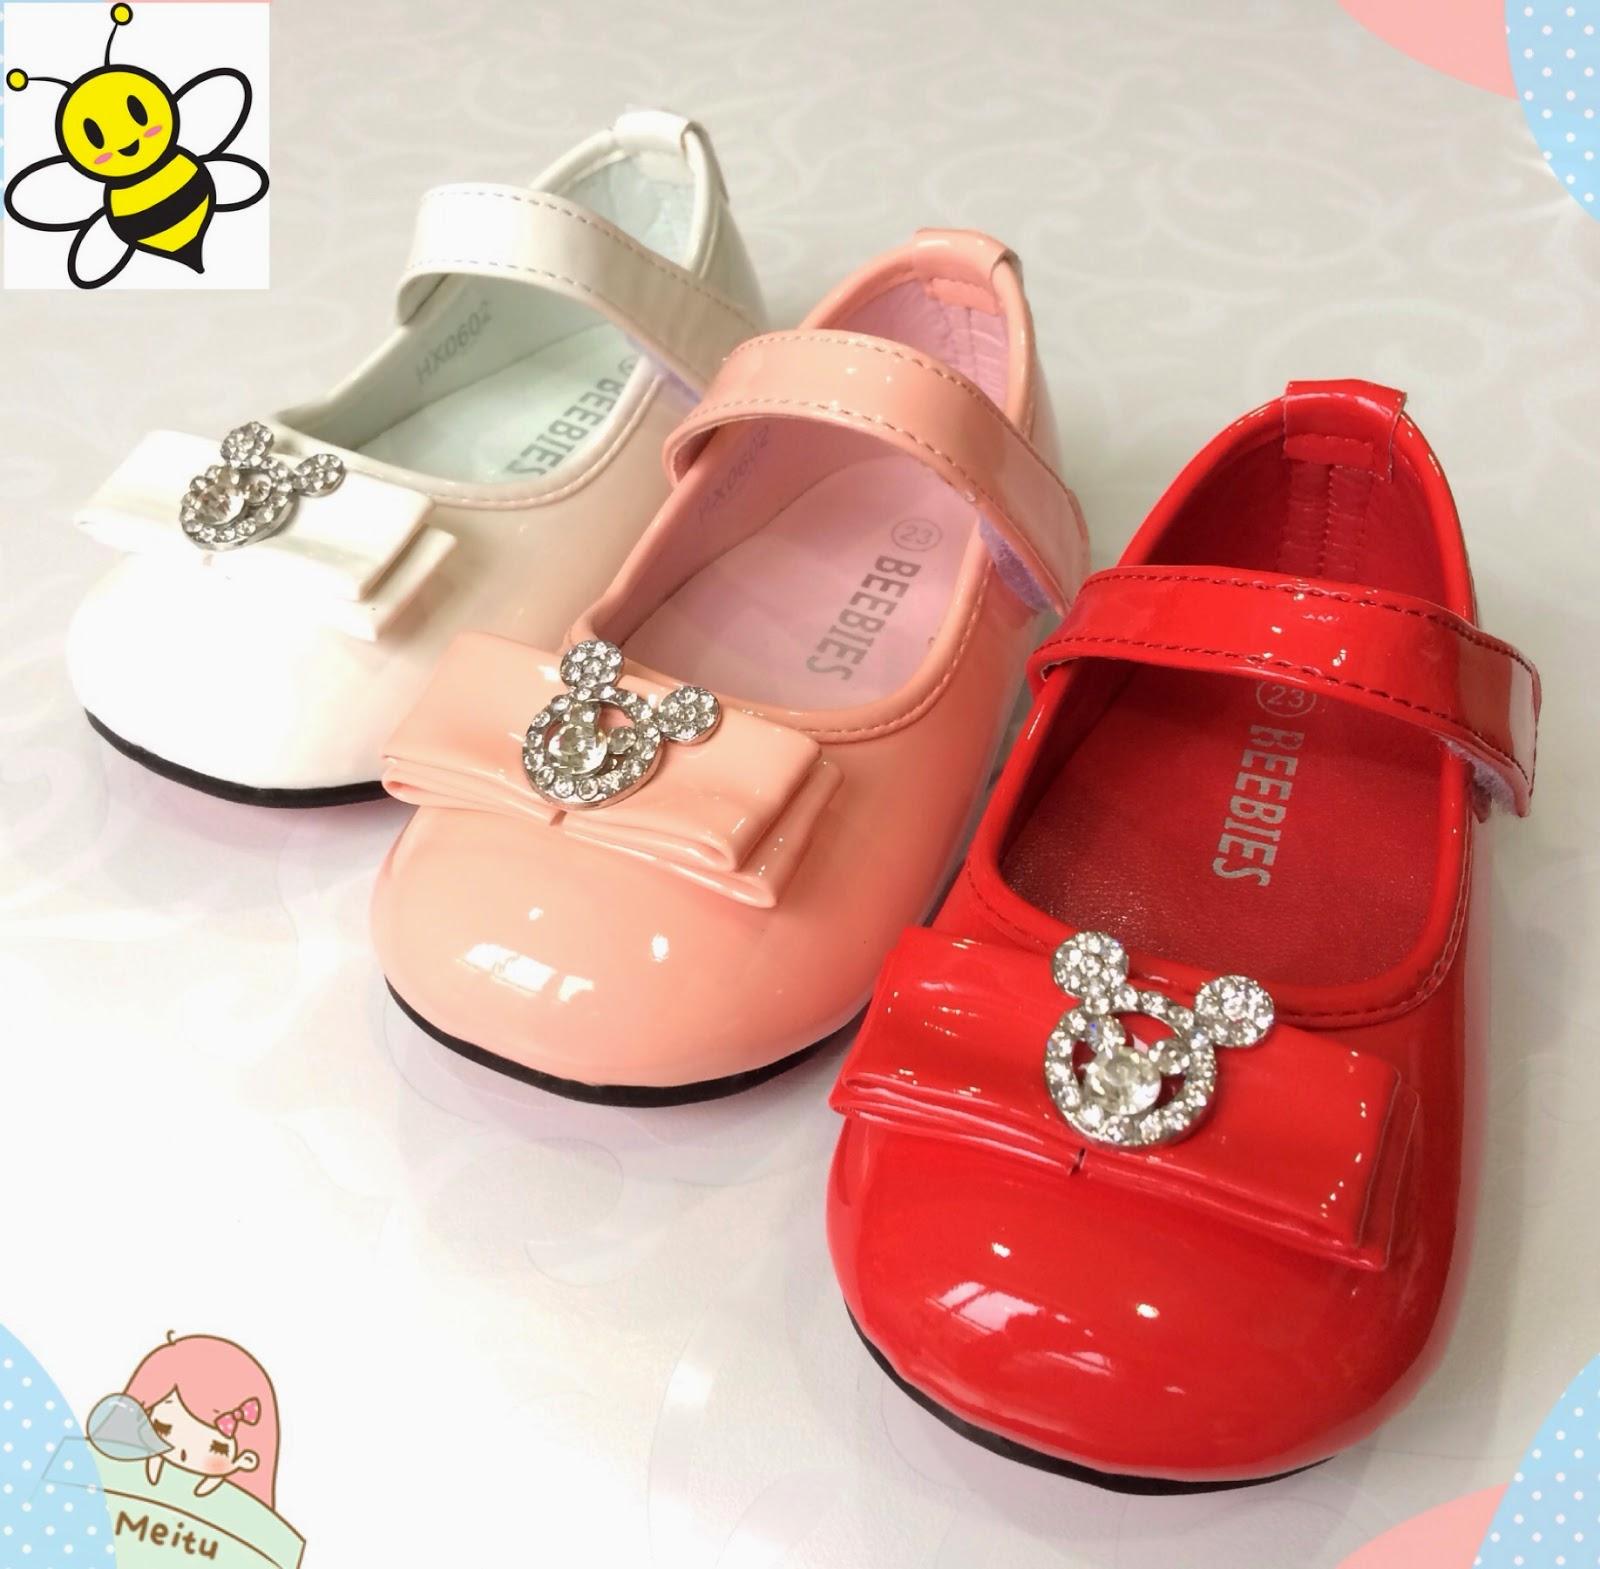 Eceran Grosir Kualitas Sepatu Anak Dan Baju Di Jakarta Sandal Balita Perempuan Slip On Bayi Cewek  Mickey House Shining Diamond Baby Shoes By Beebies